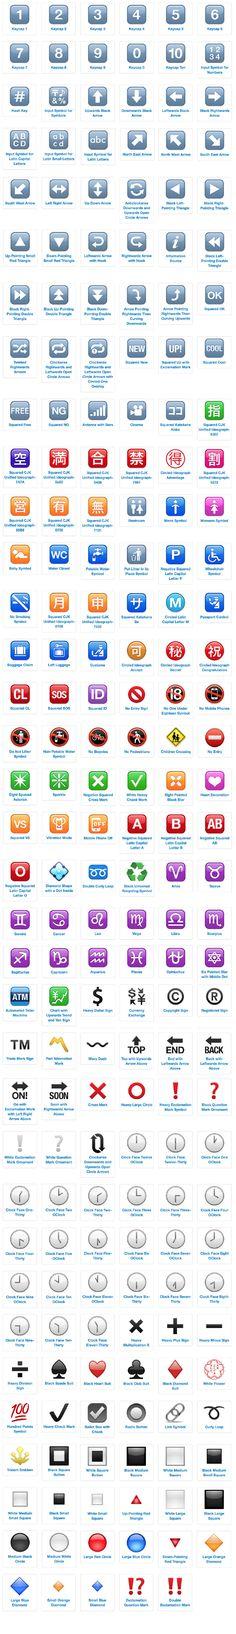 Emoji definition list